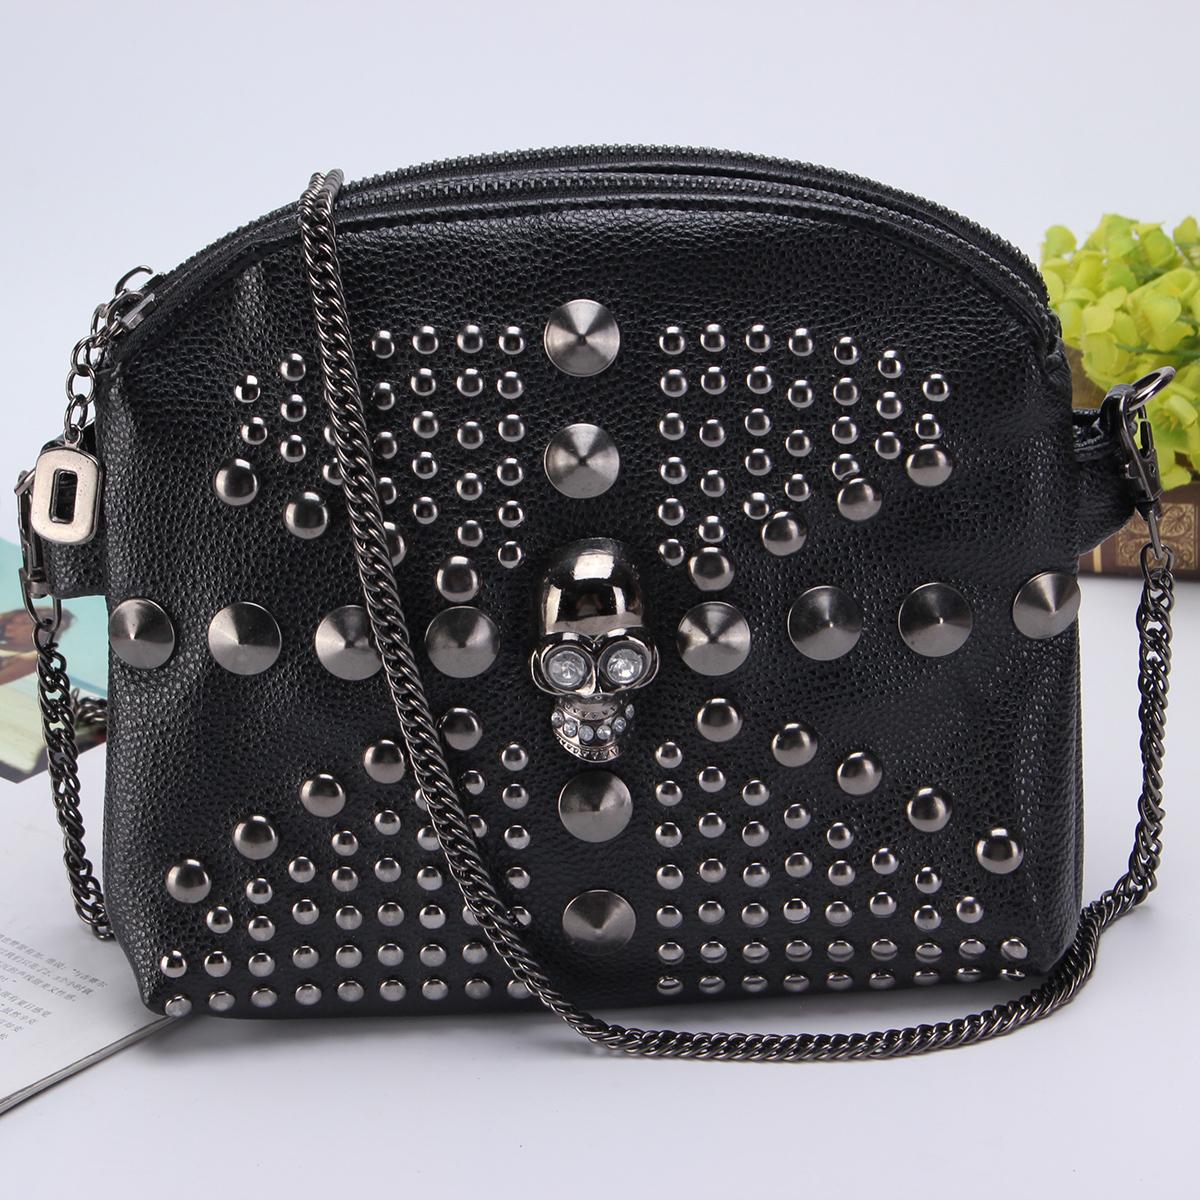 Fashion Women Punk Rock Satchel Skull Rivet Chain Shoulder Bag Crossbody Handbag